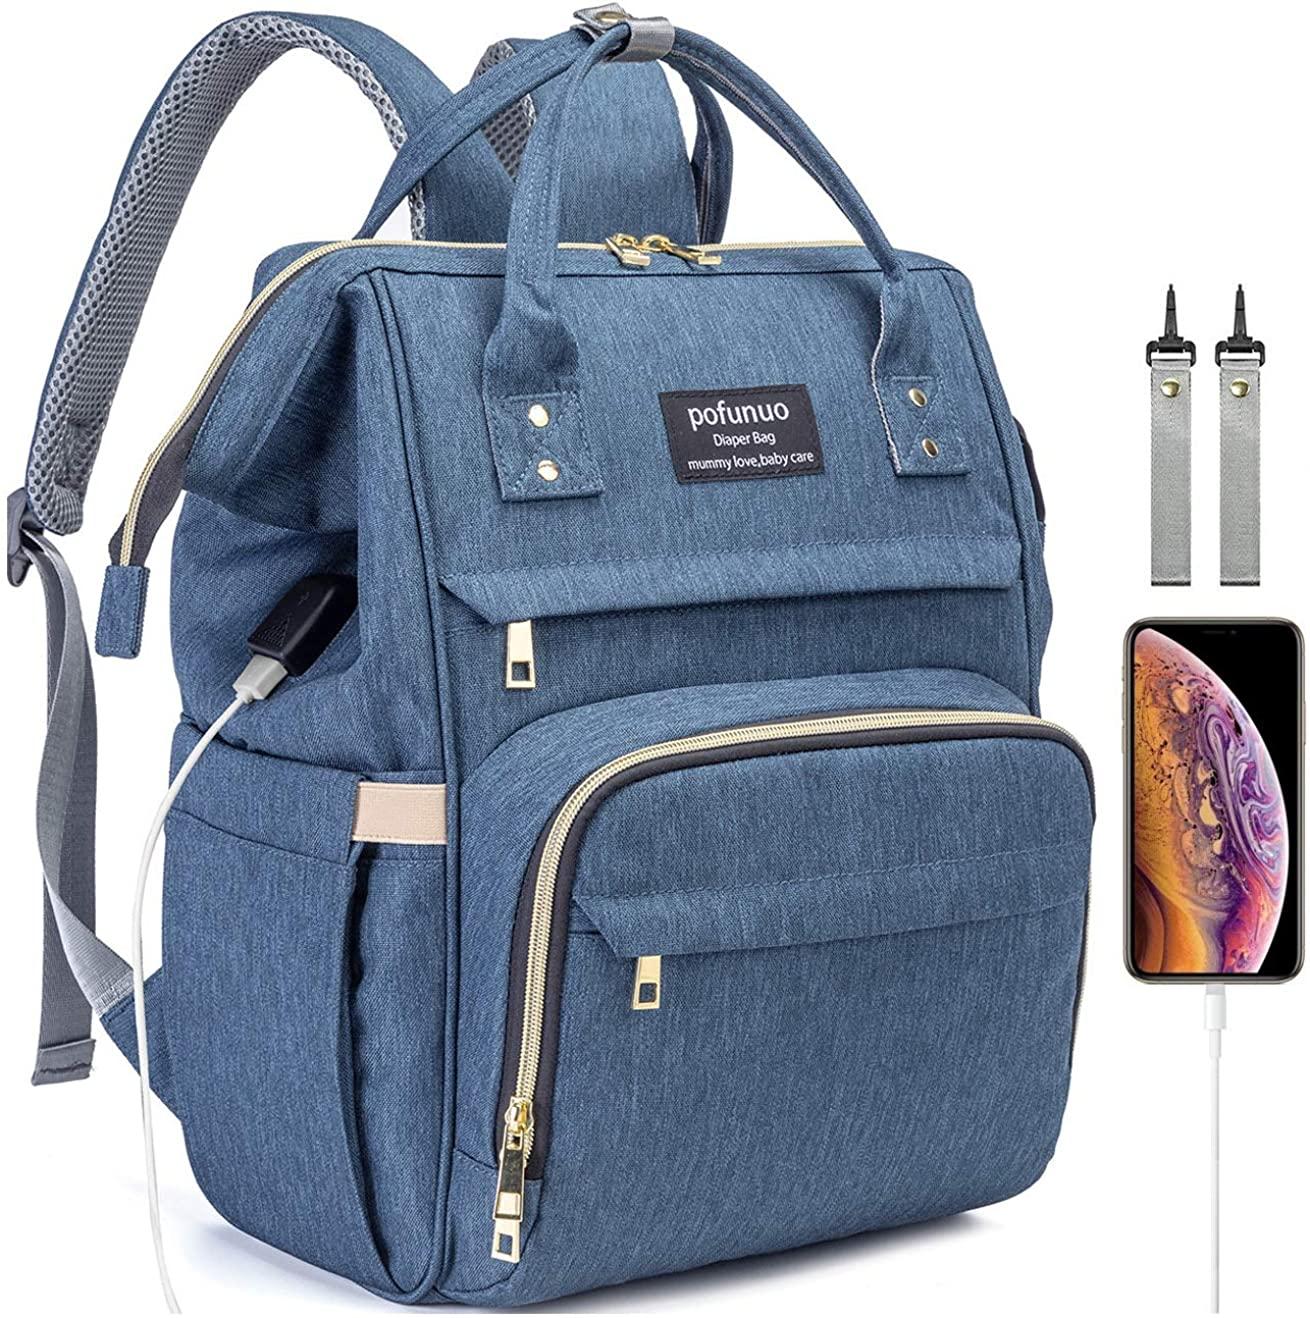 HLMBB Diaper Bag Backpack, Large Capacity for Baby Multifunction Waterproof USB Port